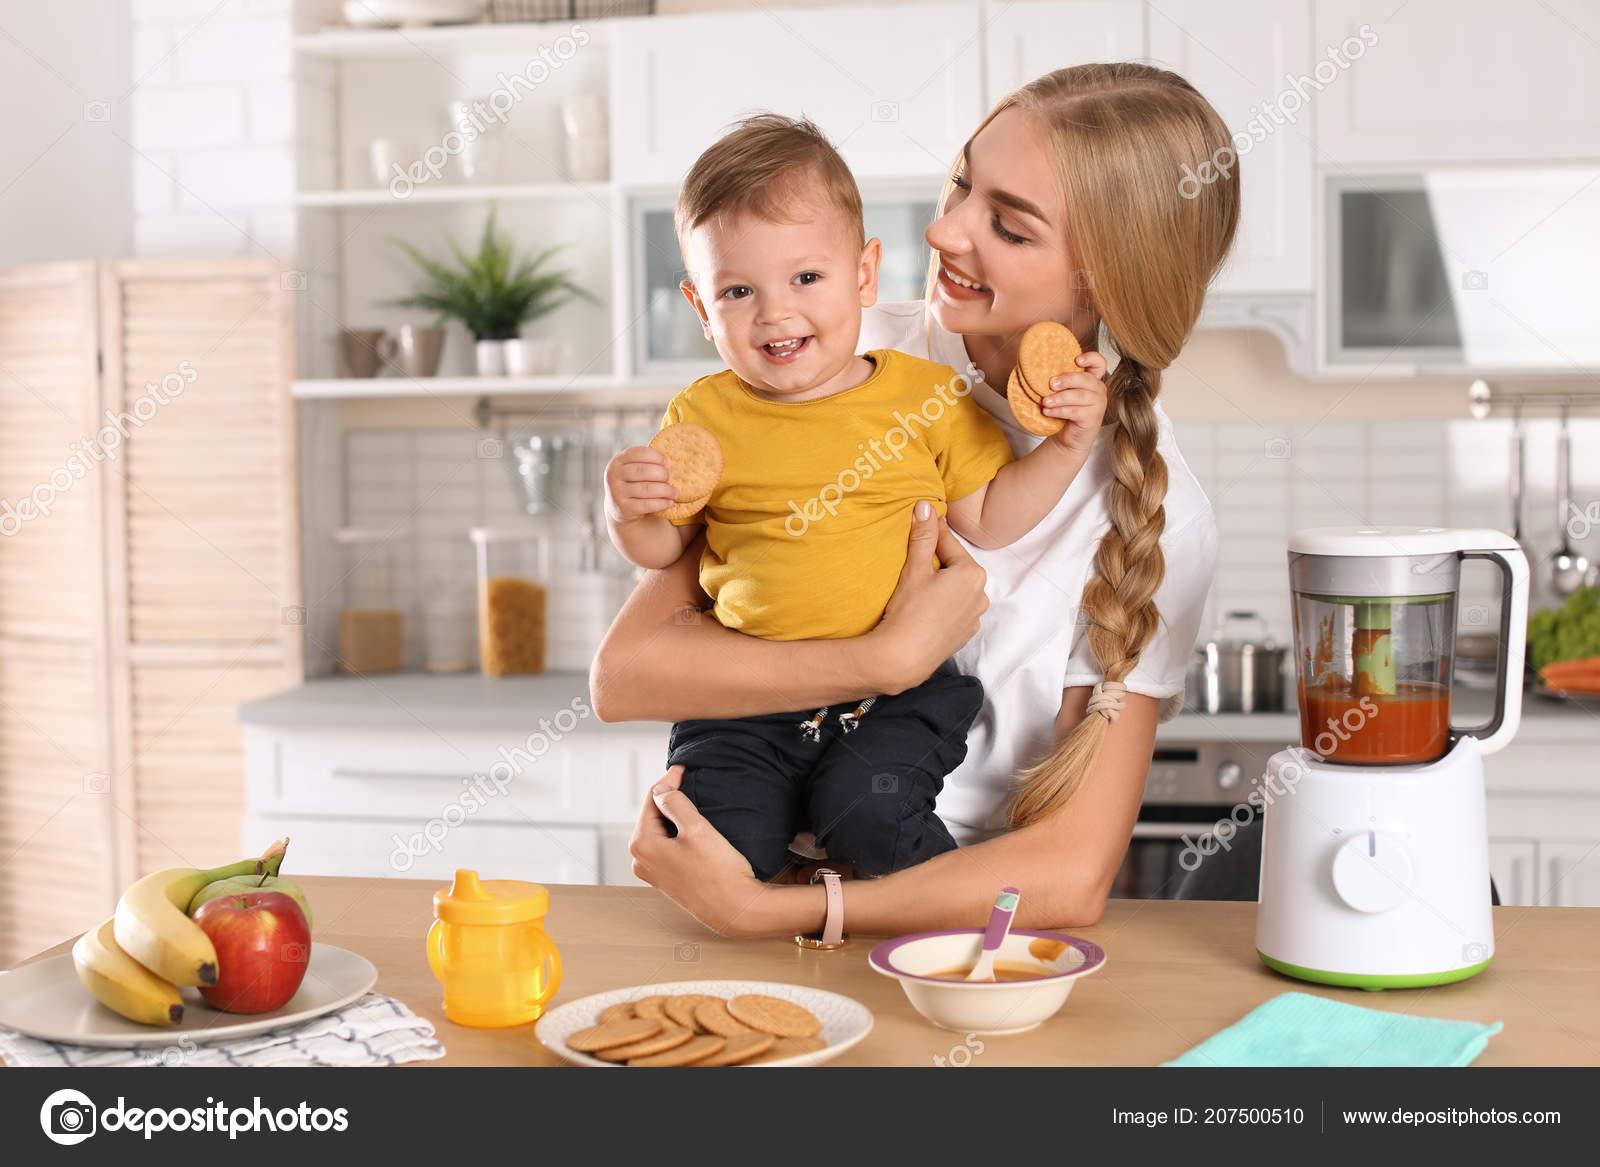 ellas kitchen baby food drain pipe 在厨房喂孩子的女人健康婴儿食品 图库照片 c liudmilachernetska gmail